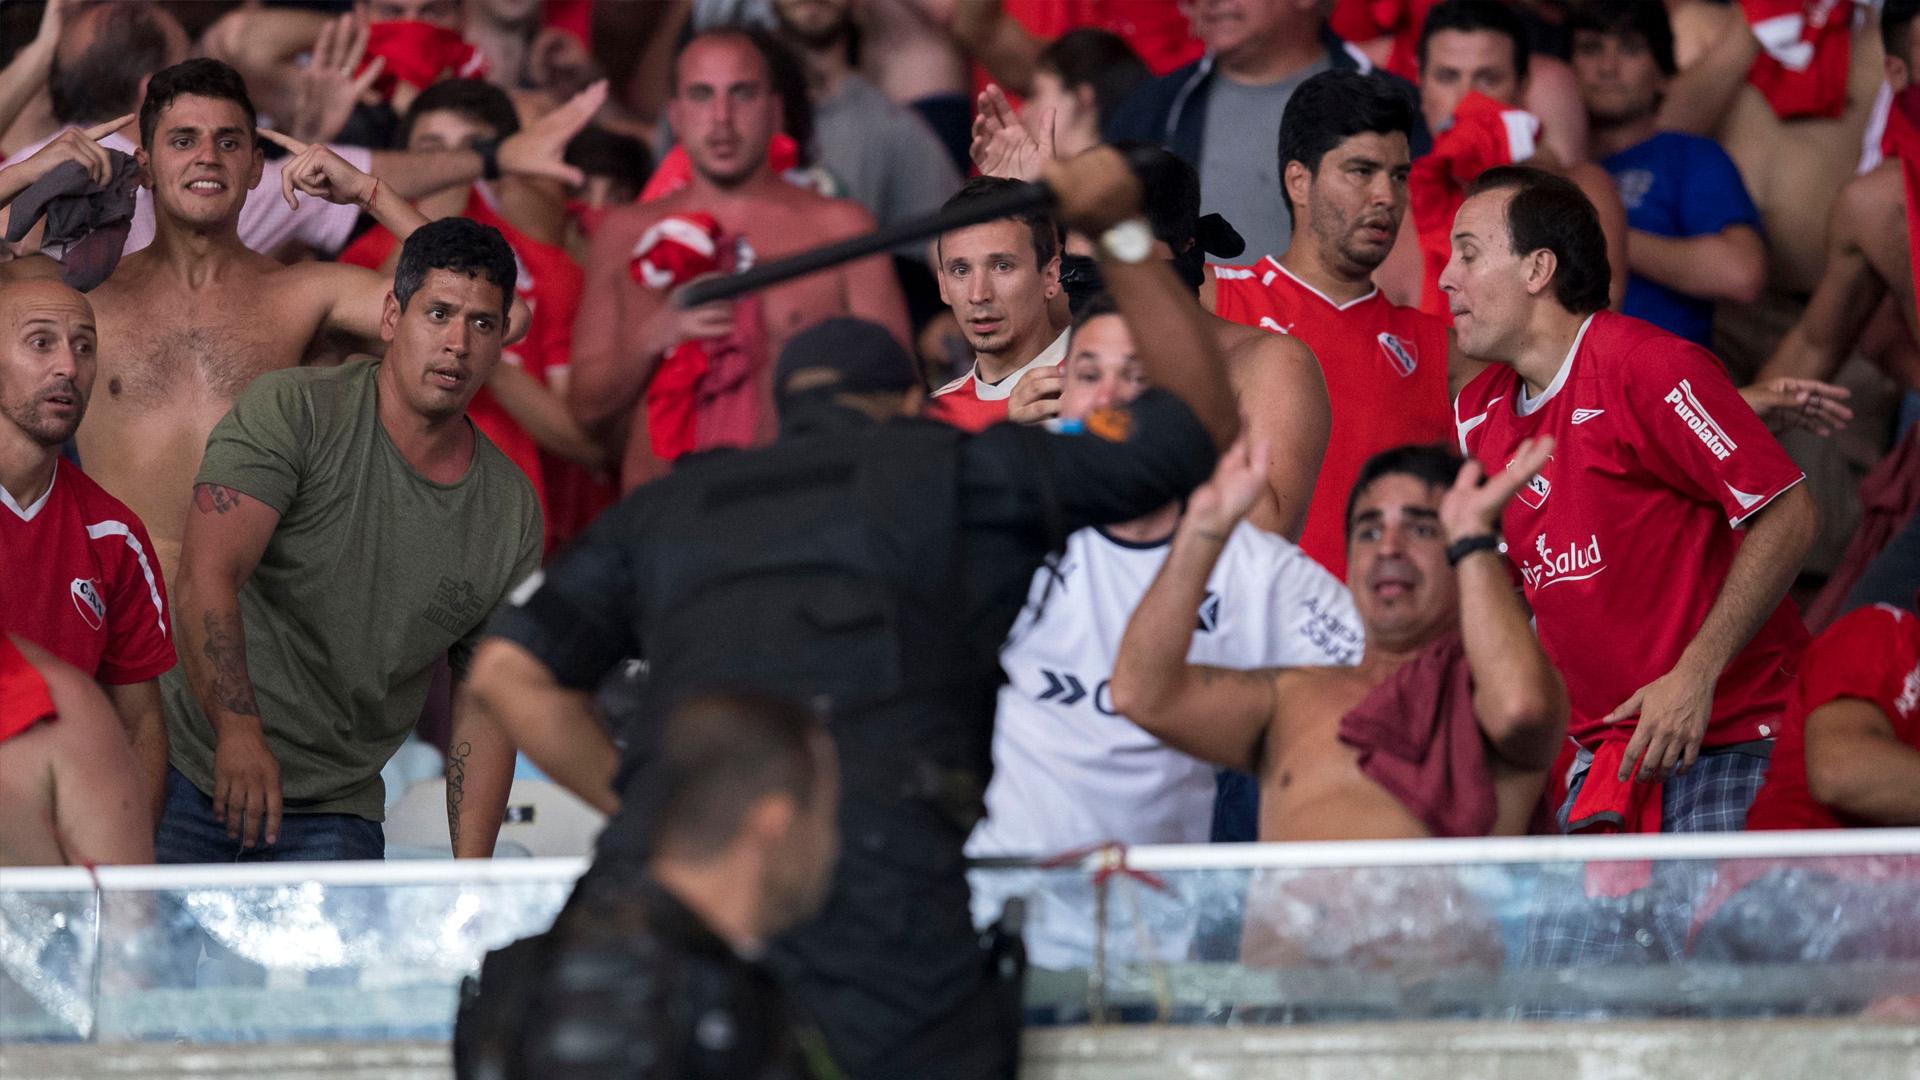 Flamengo x Independiente 13 12 17 Sul Americana Maracanã